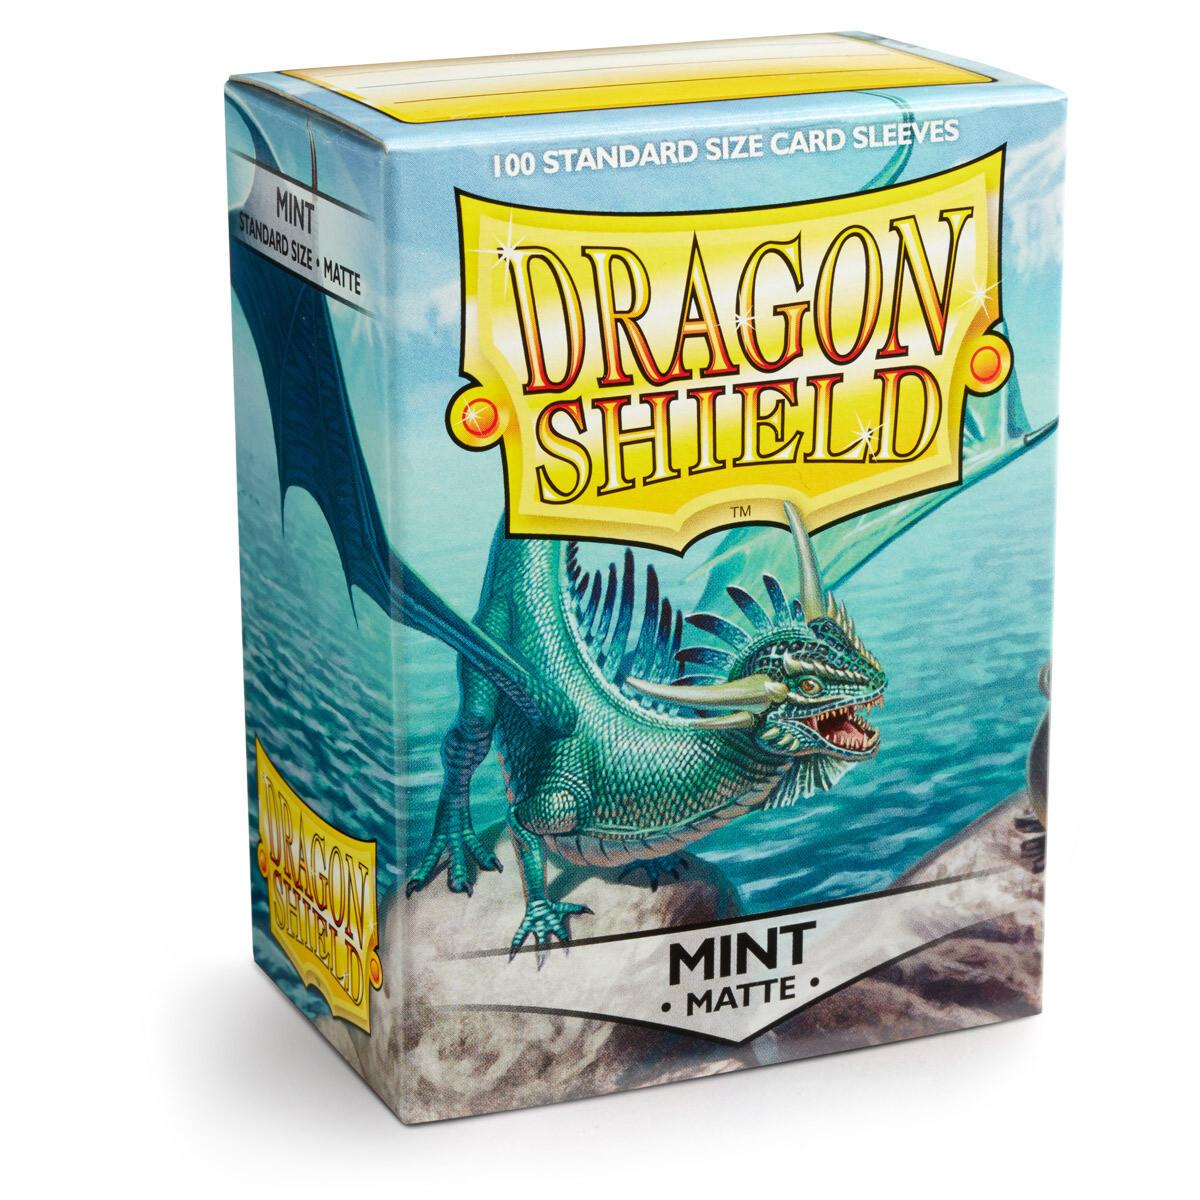 Dragon Shield 100 Sleeves - Matte Mint